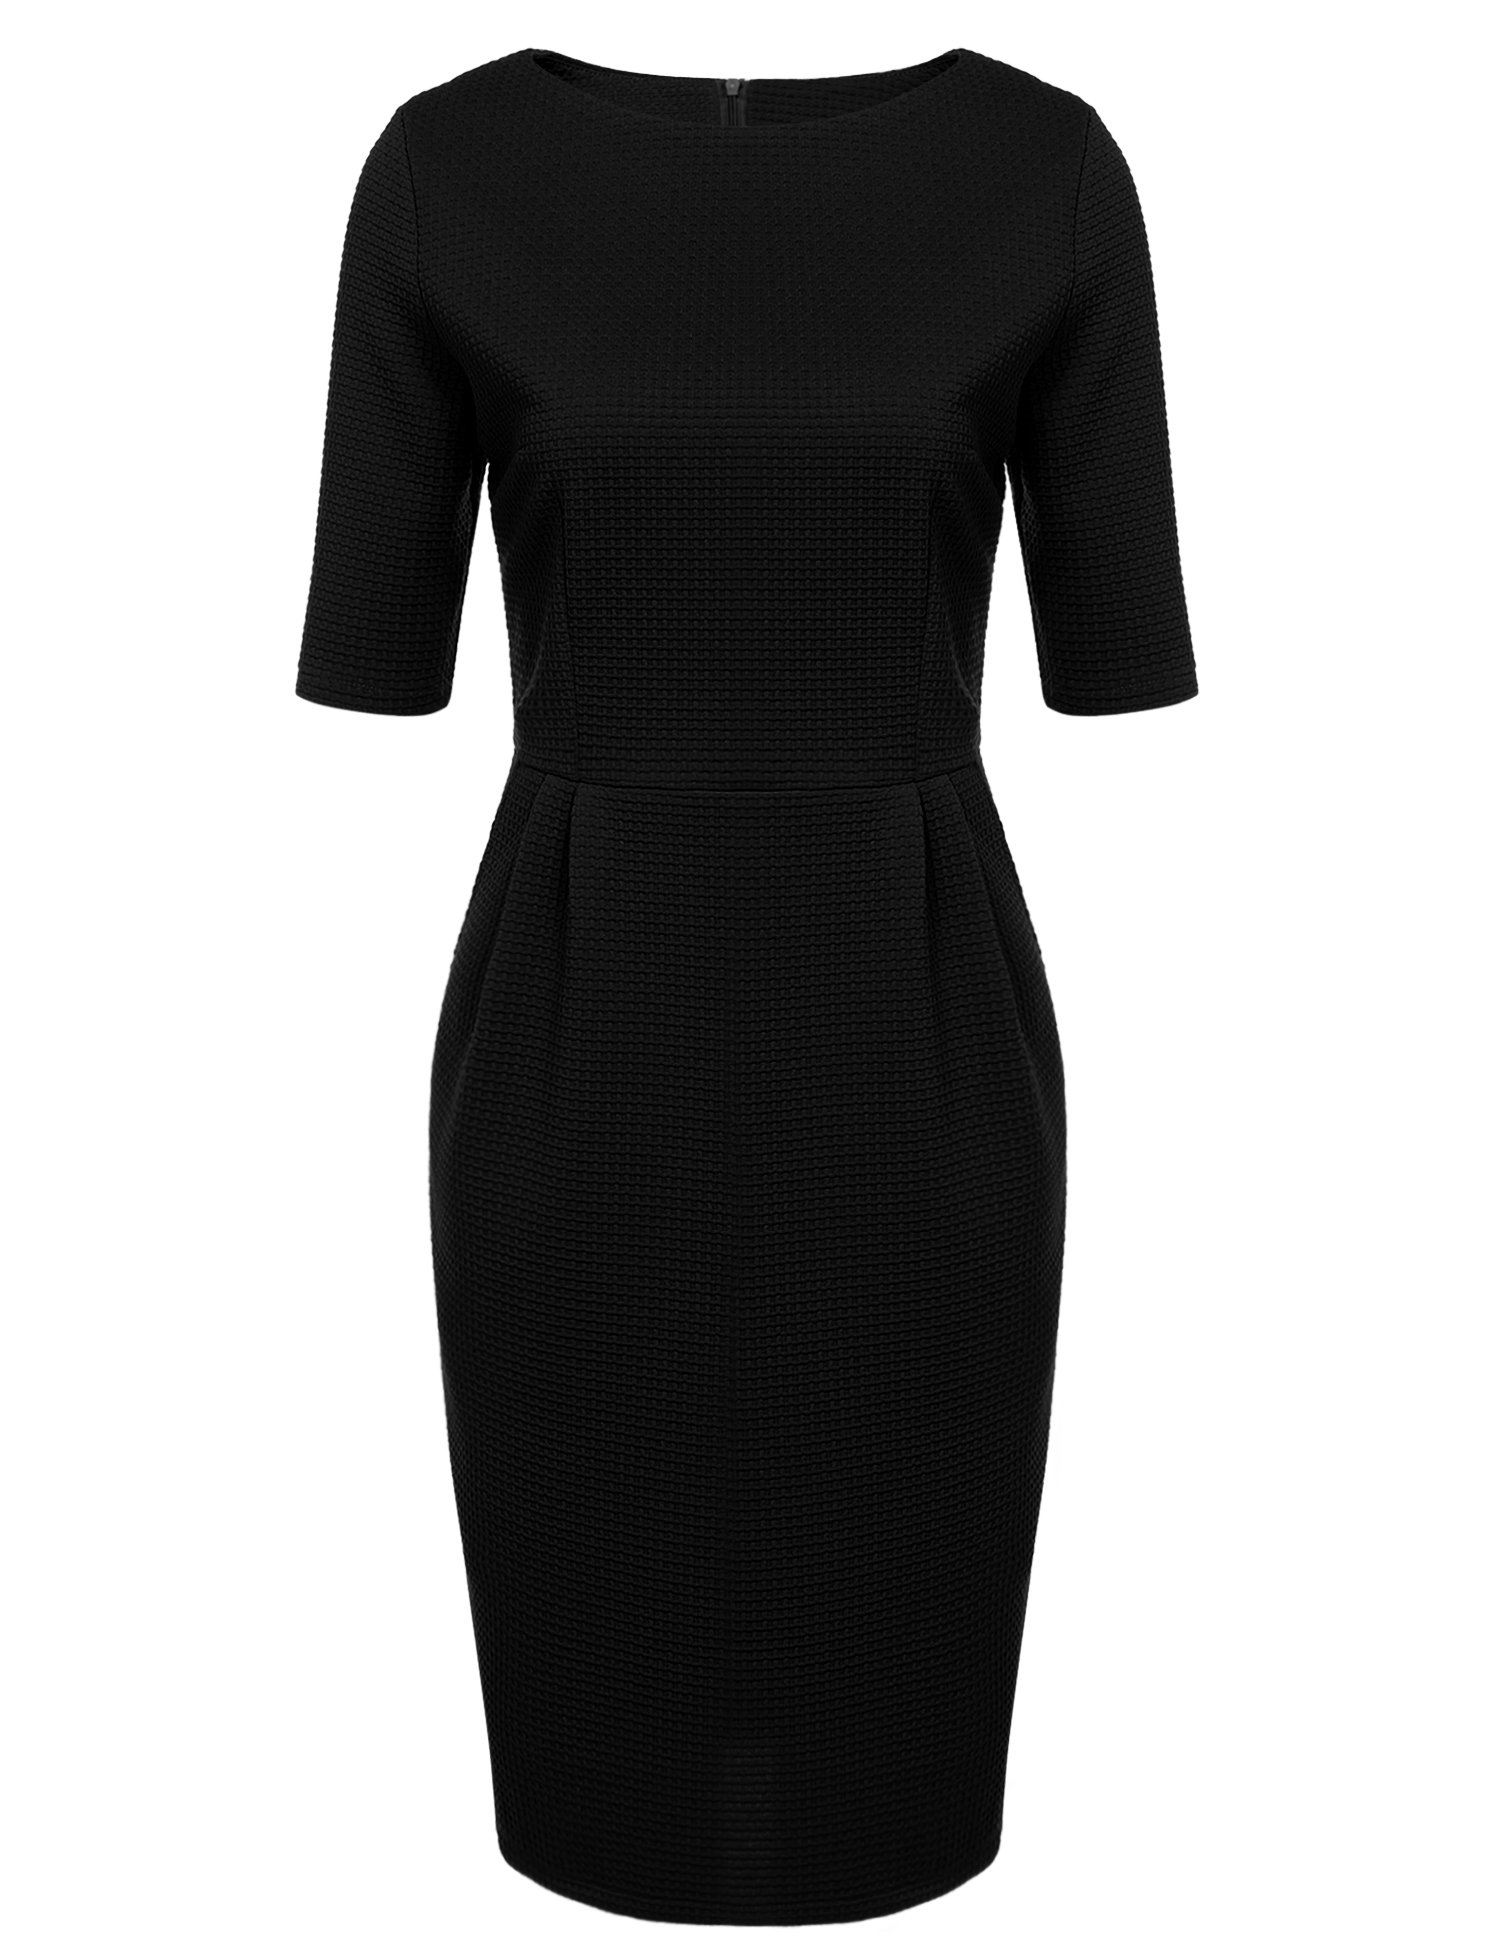 ANGVNS Women Retro 1950s Style Half Sleeve Slim Business Pencil Dress, Black, XL